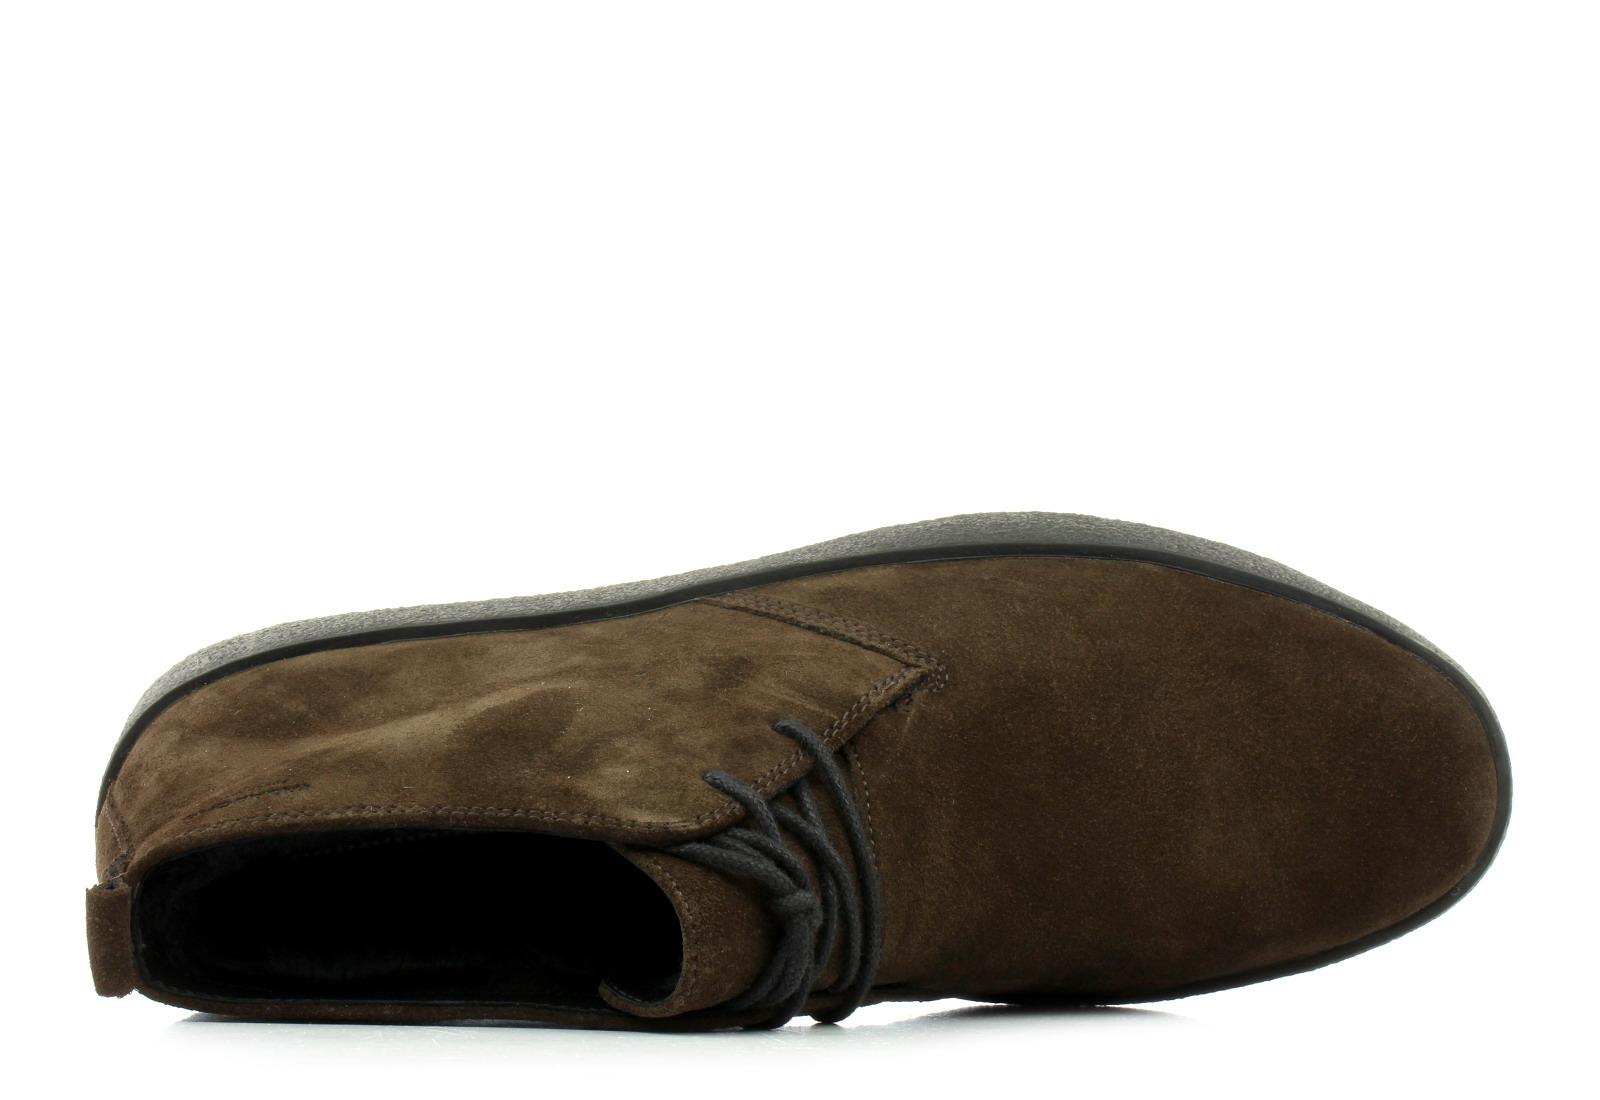 6ad10e326322 Vagabond Cipő - Luis - 4692-040-31 - Office Shoes Magyarország